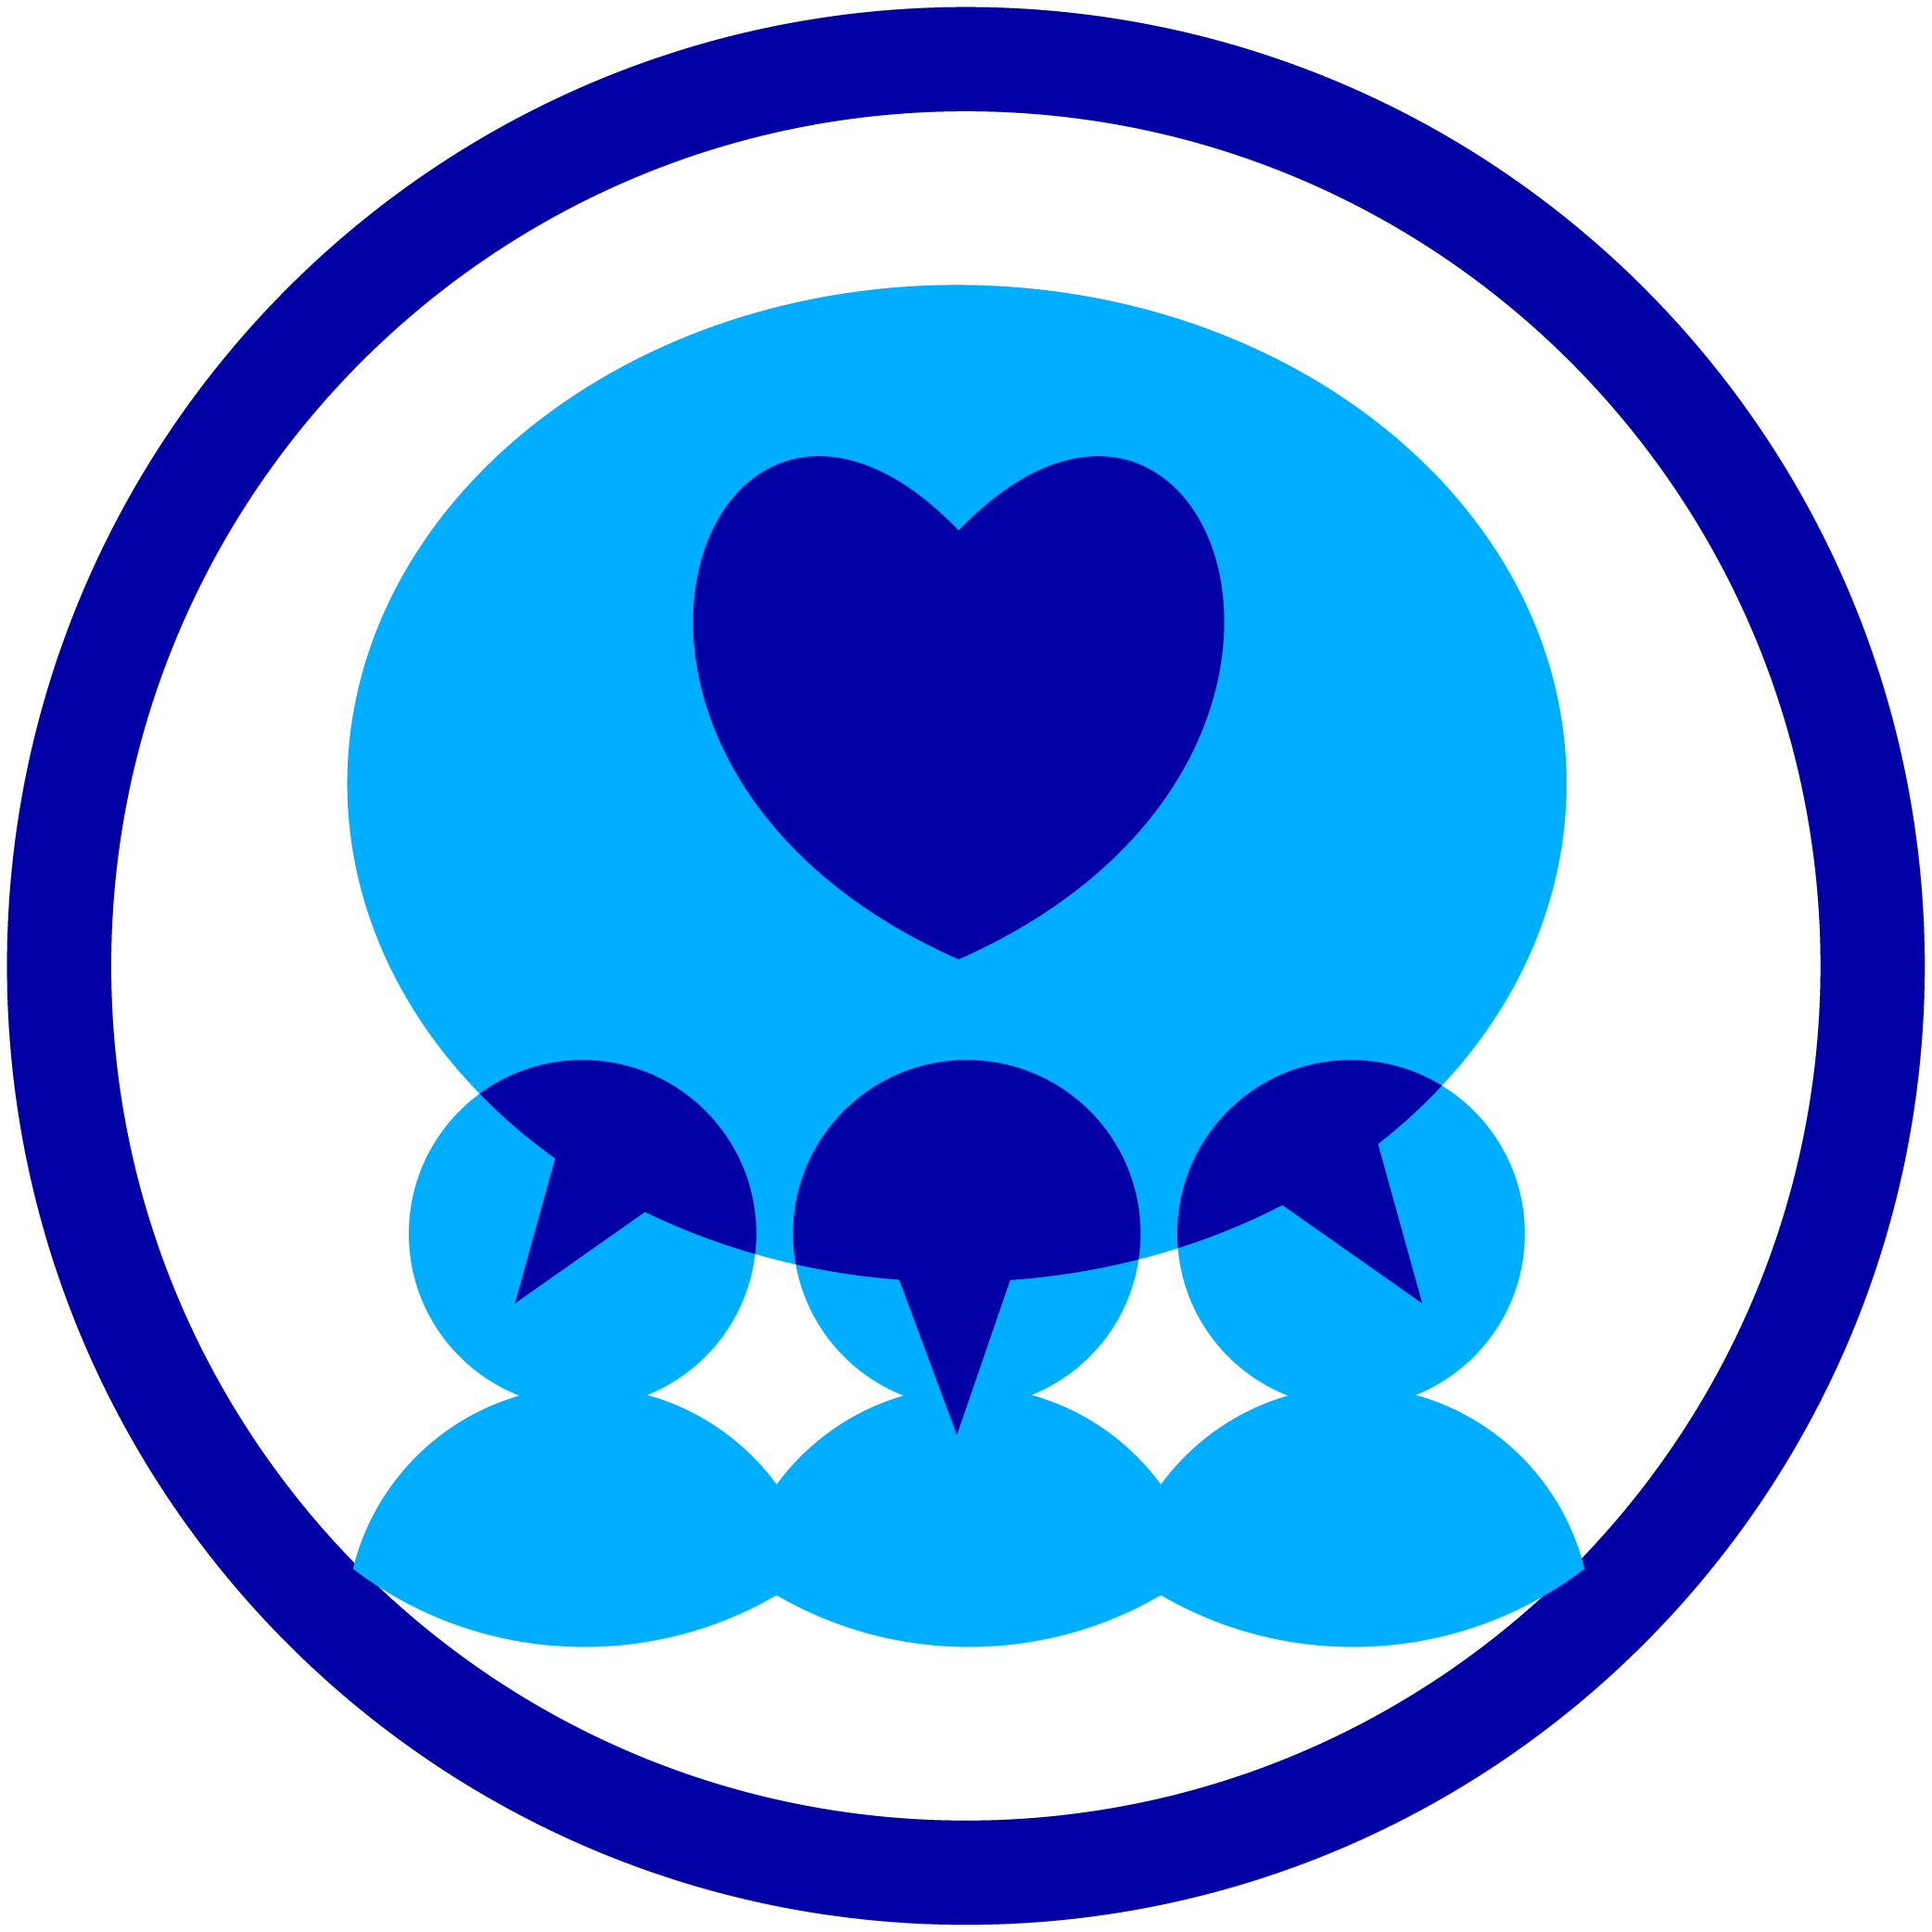 https://it.fi-group.com/wp-content/uploads/sites/10/2021/02/blue-icons-set_1-54.png